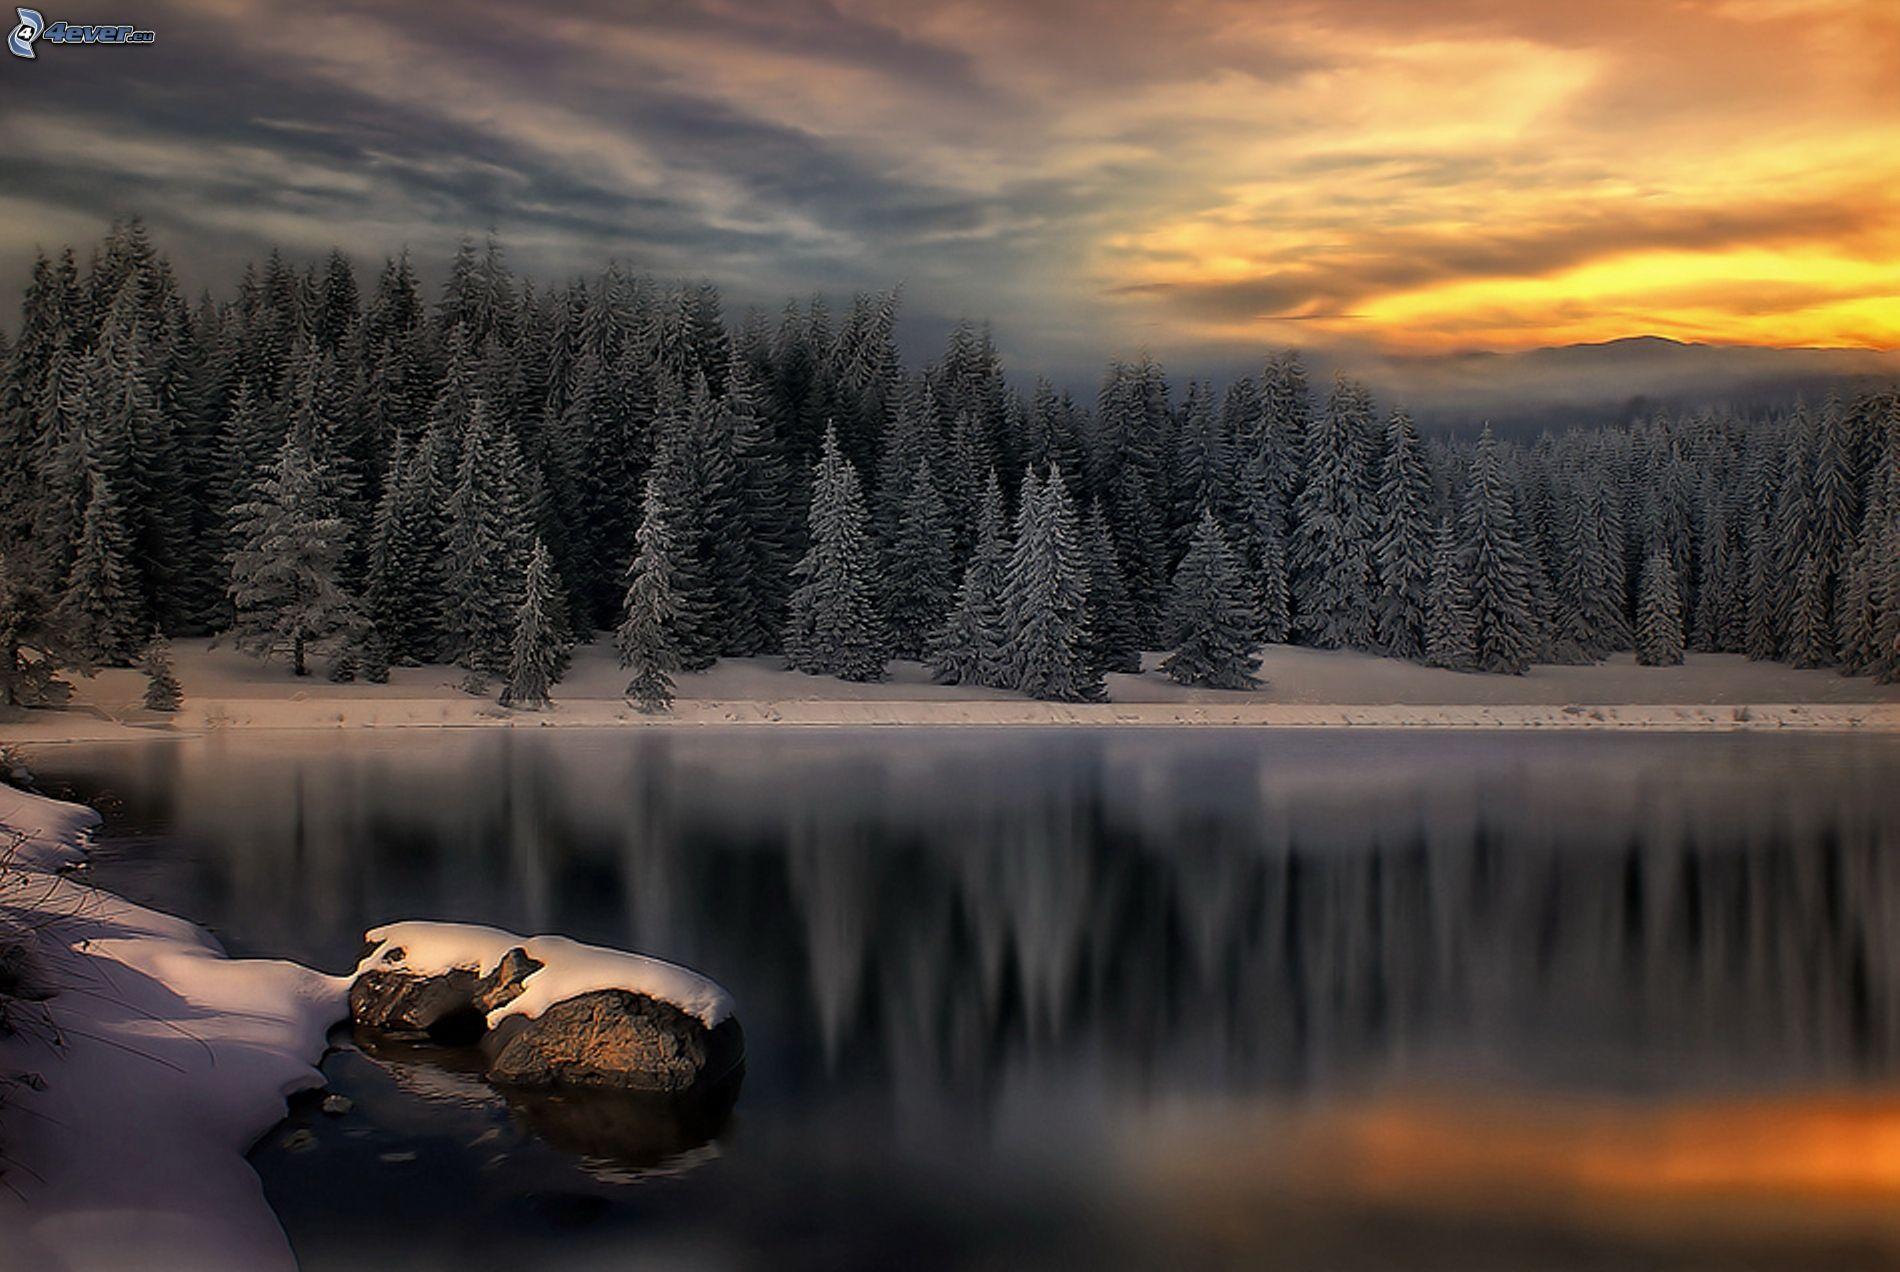 Zalazak sunca  - Page 6 Pokojne-zimne-jazero,-les,-zapad-slnka-151755